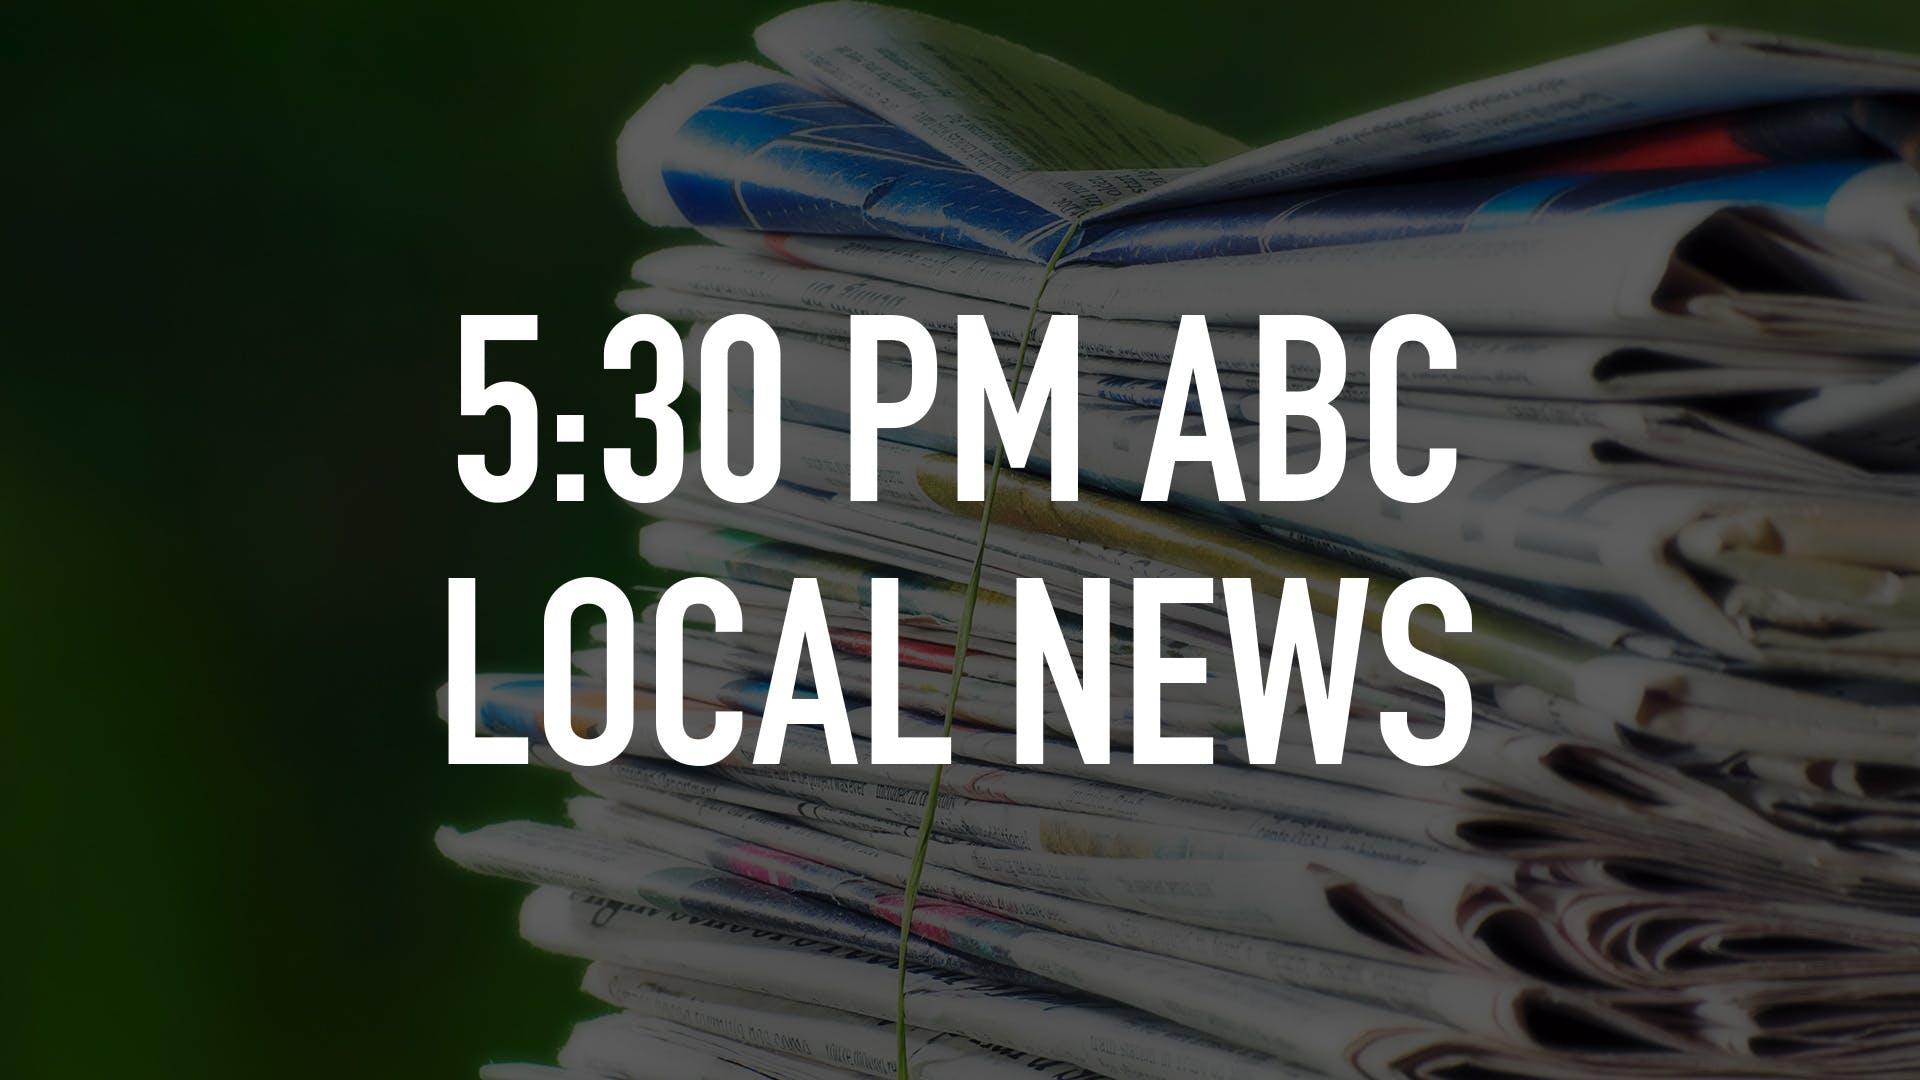 Watch 5:30 PM ABC Local News | Stream on fuboTV (Free Trial)